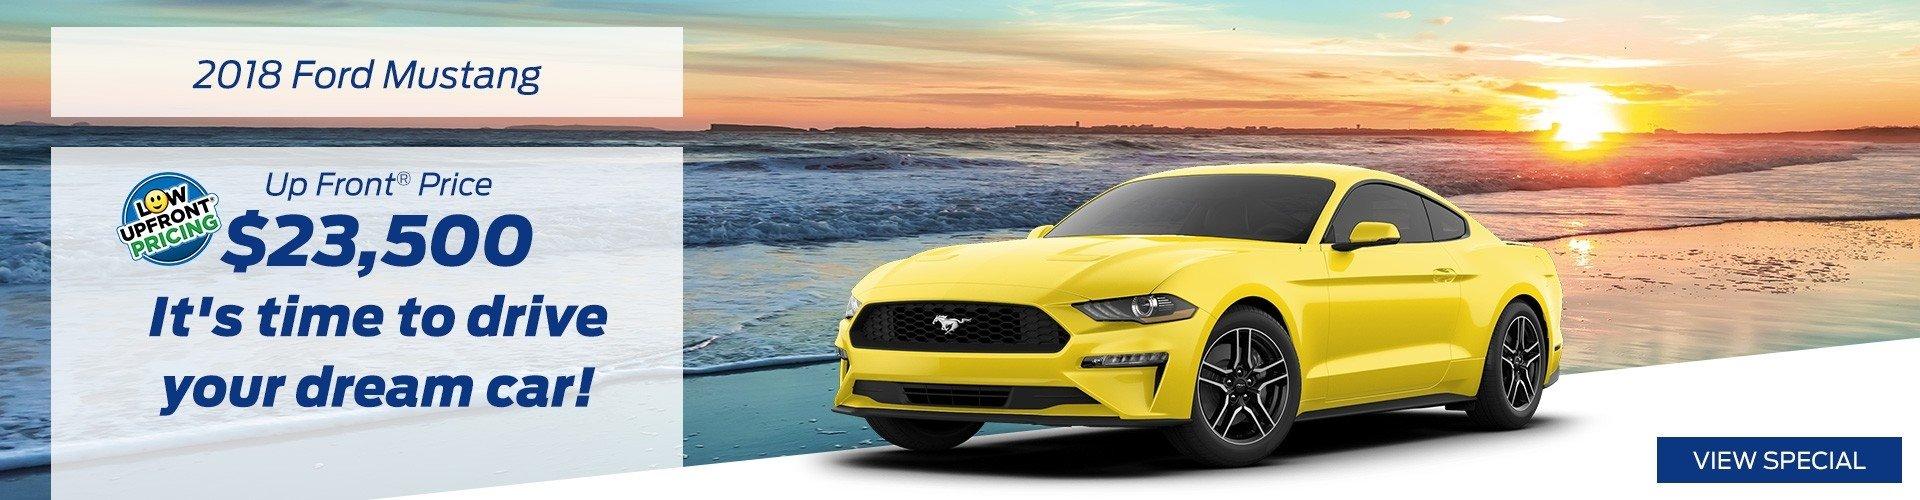 October 2018 Mustang Special